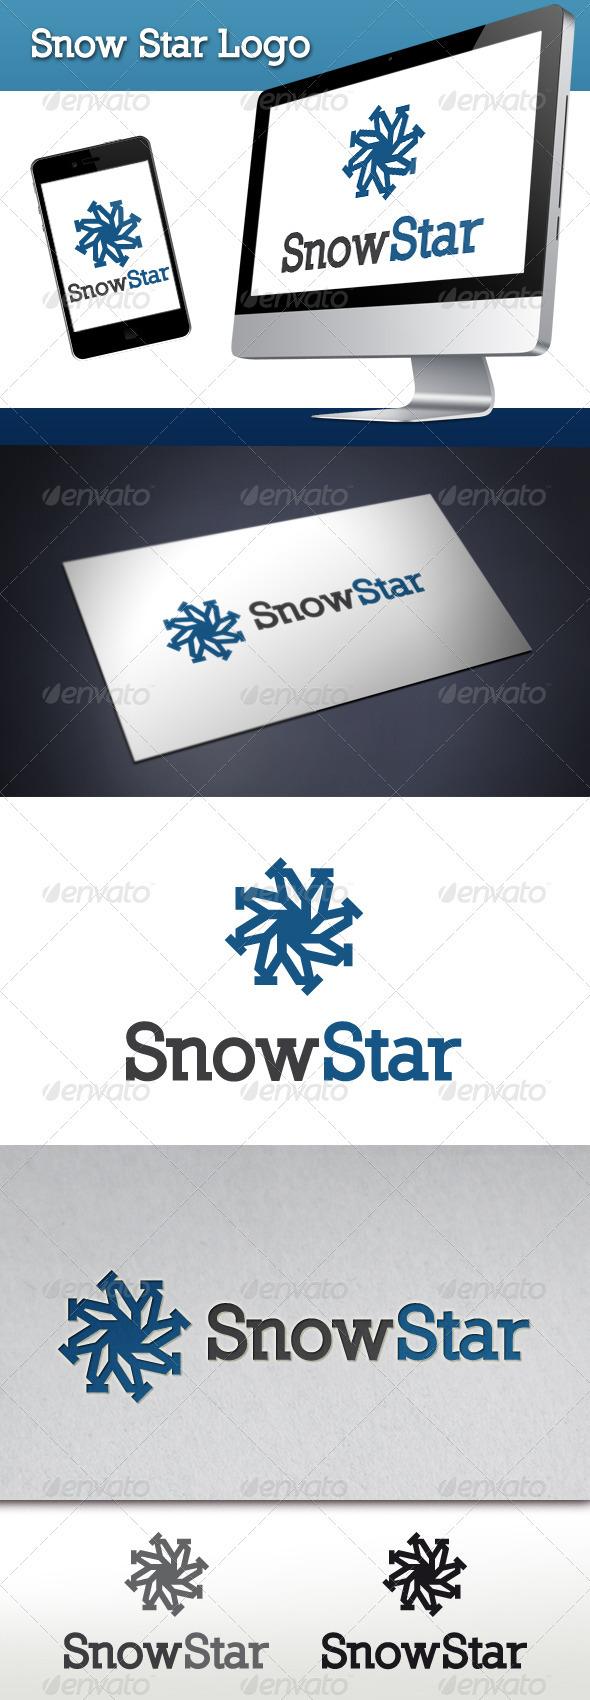 Snow Star Logo Template